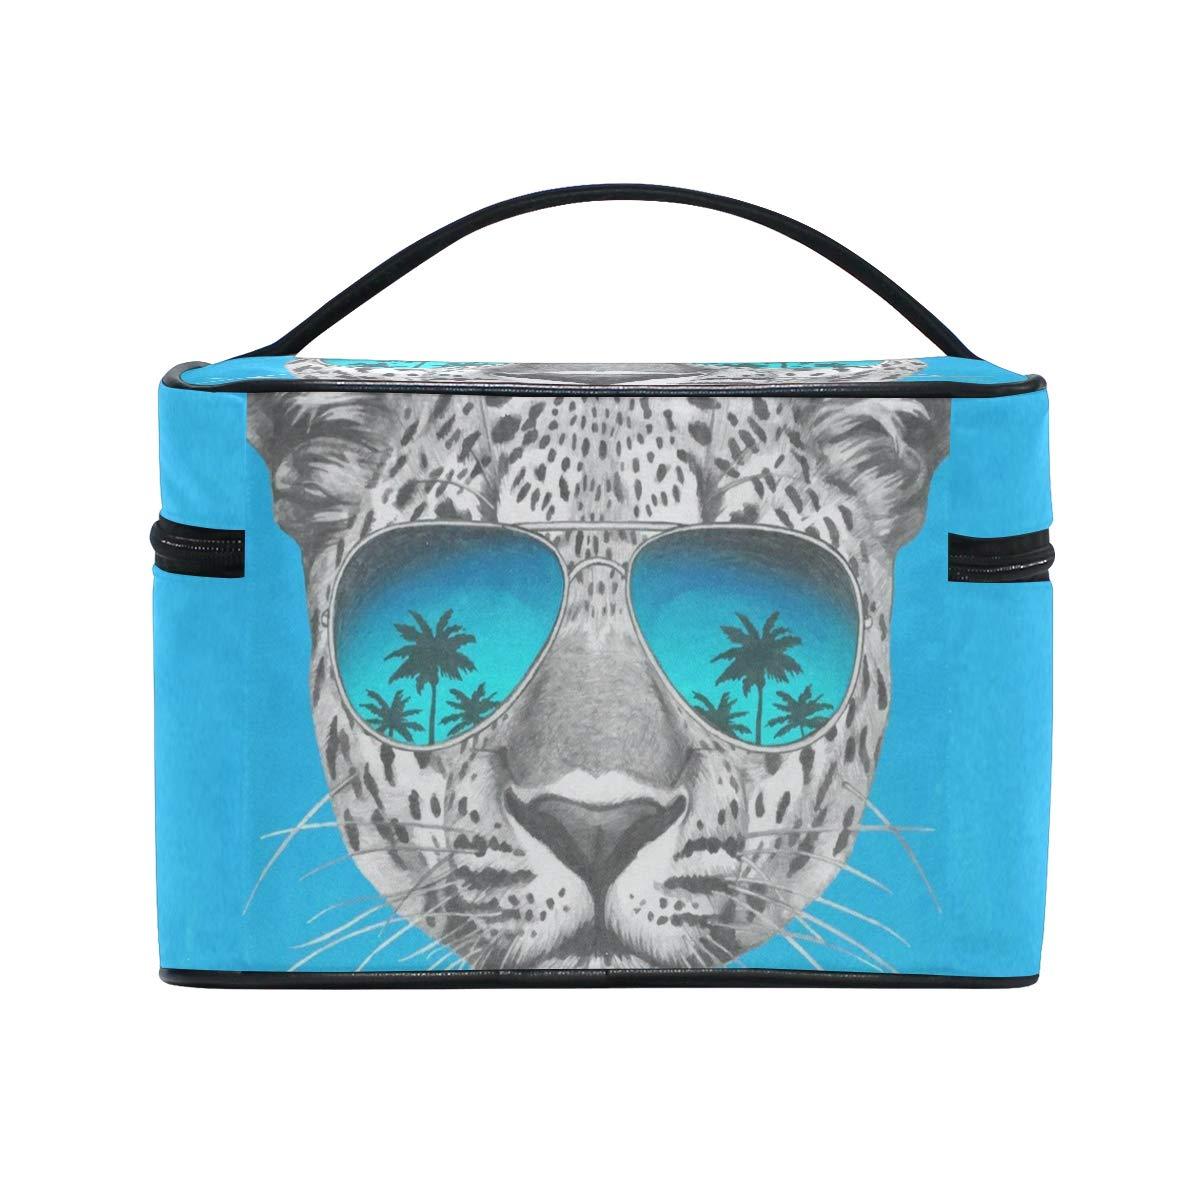 0dc888a86f90 Amazon.com : Cosmetic Bag Juicy Watermelon Womens Makeup Organizer ...